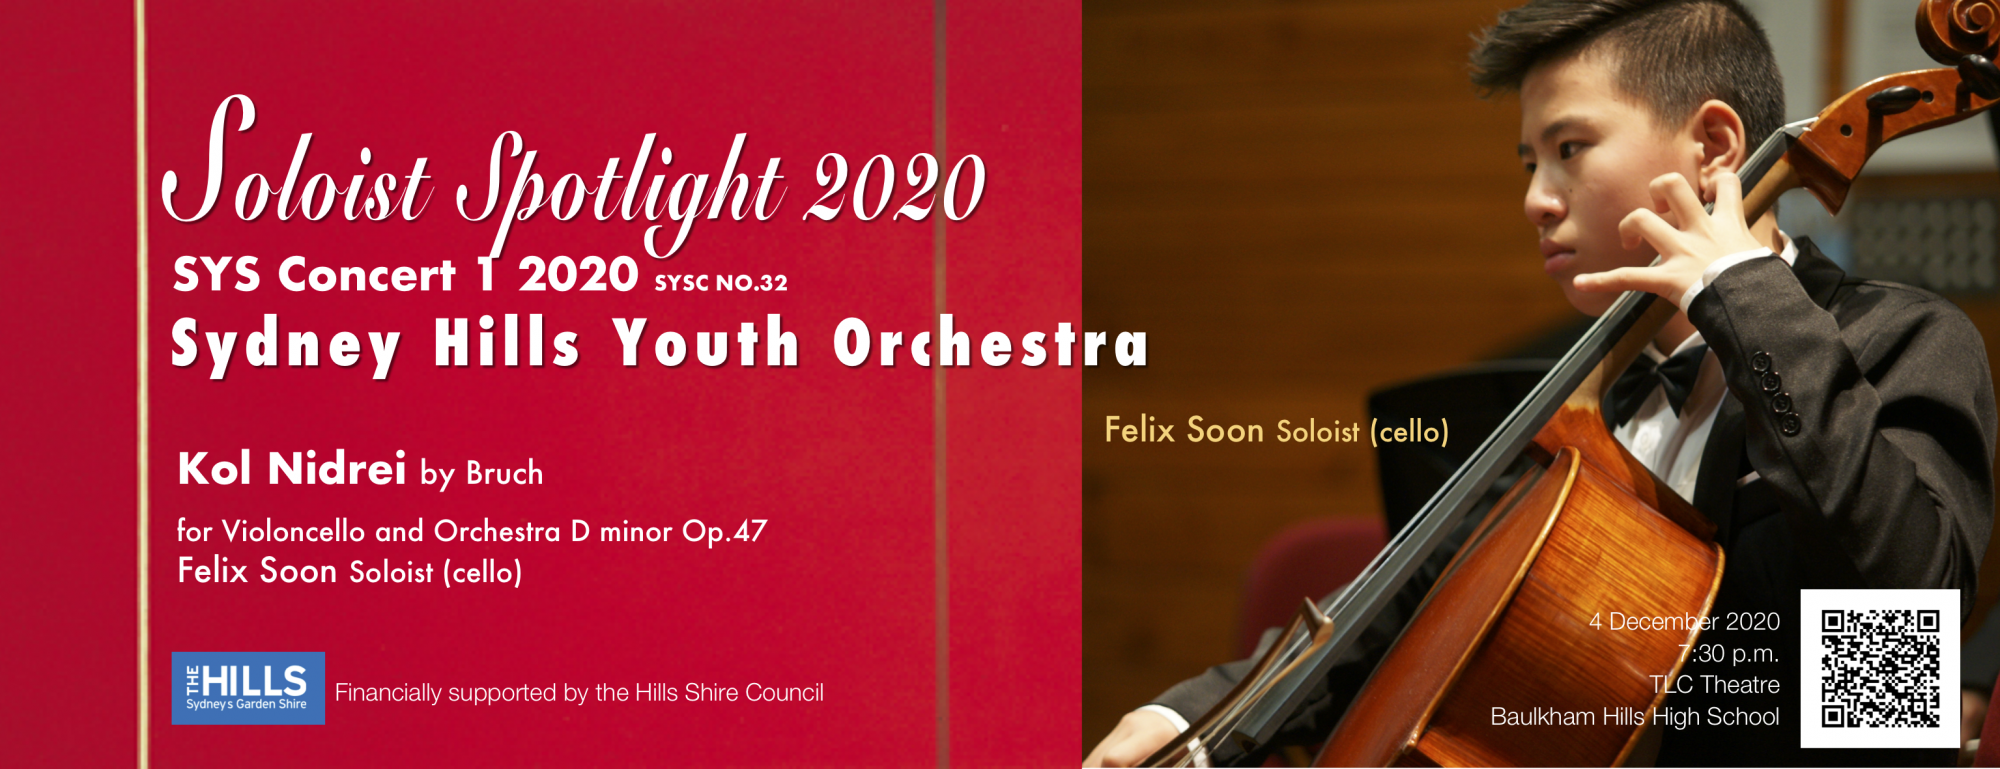 Soloist Spotlight 2020